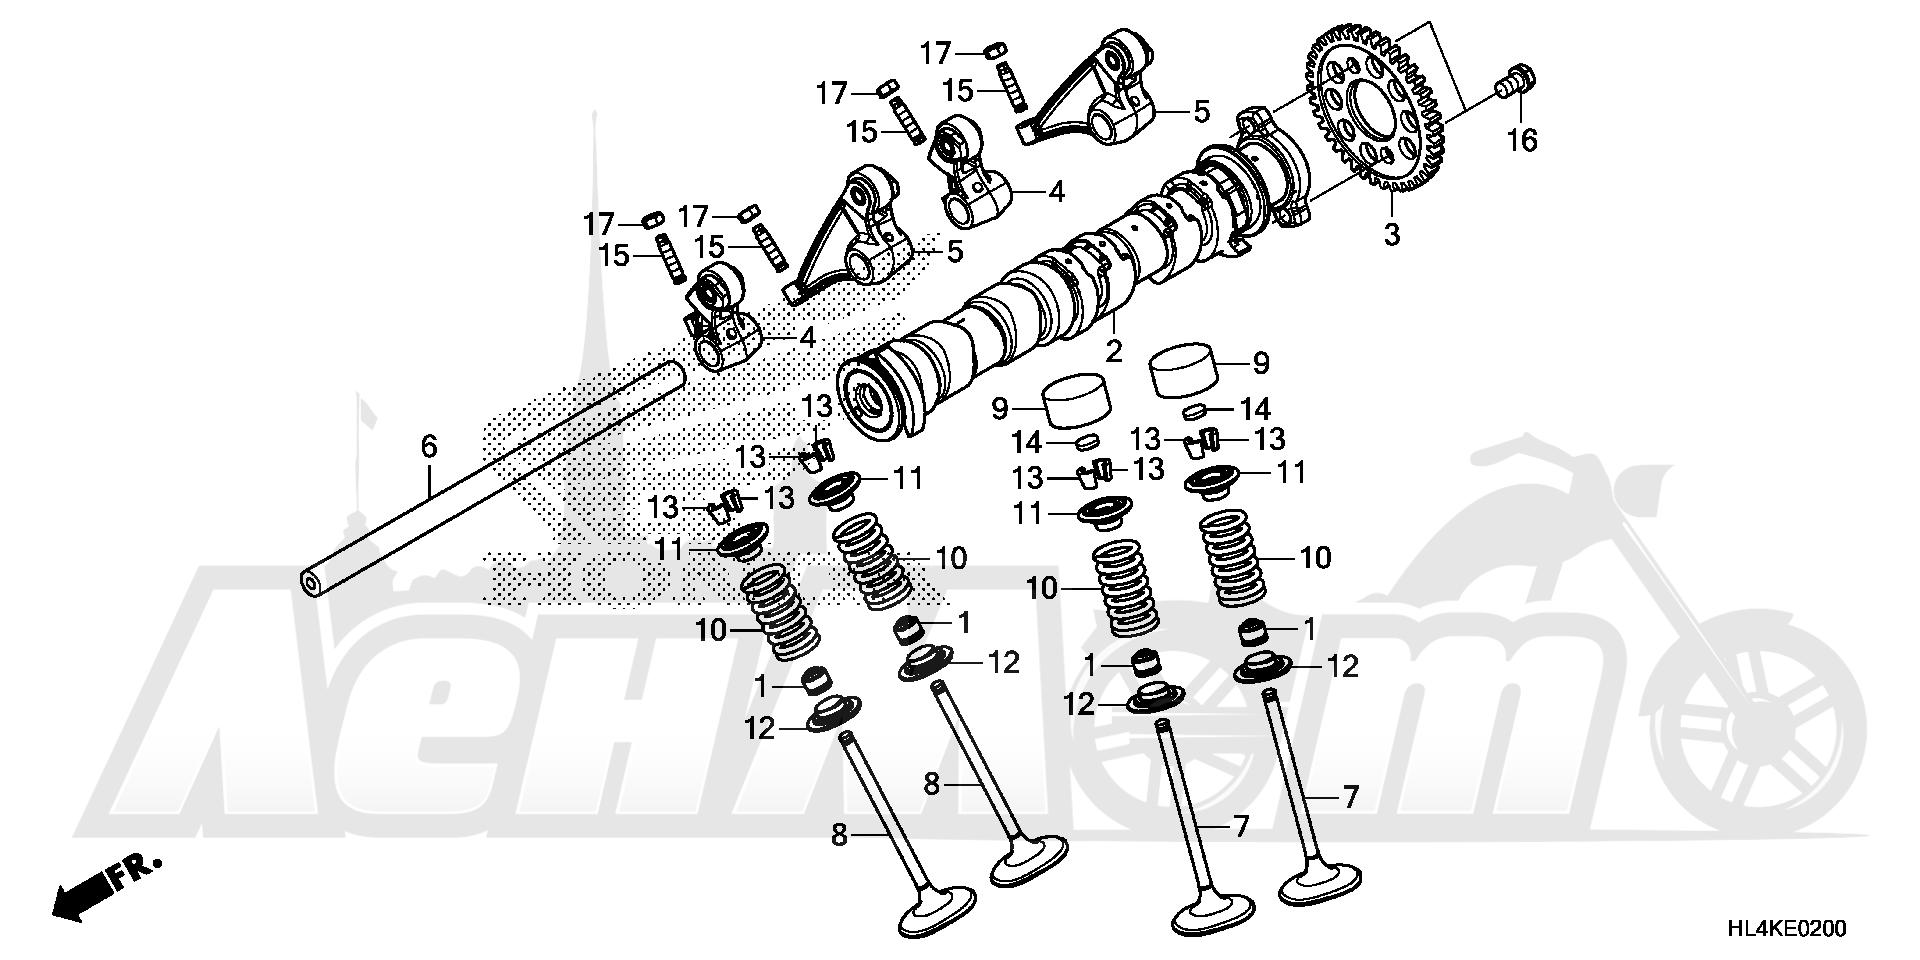 Запчасти для Квадроцикла Honda 2019 SXS1000M5L Раздел: CAMSHAFT AND VALVE | распредвал и клапан